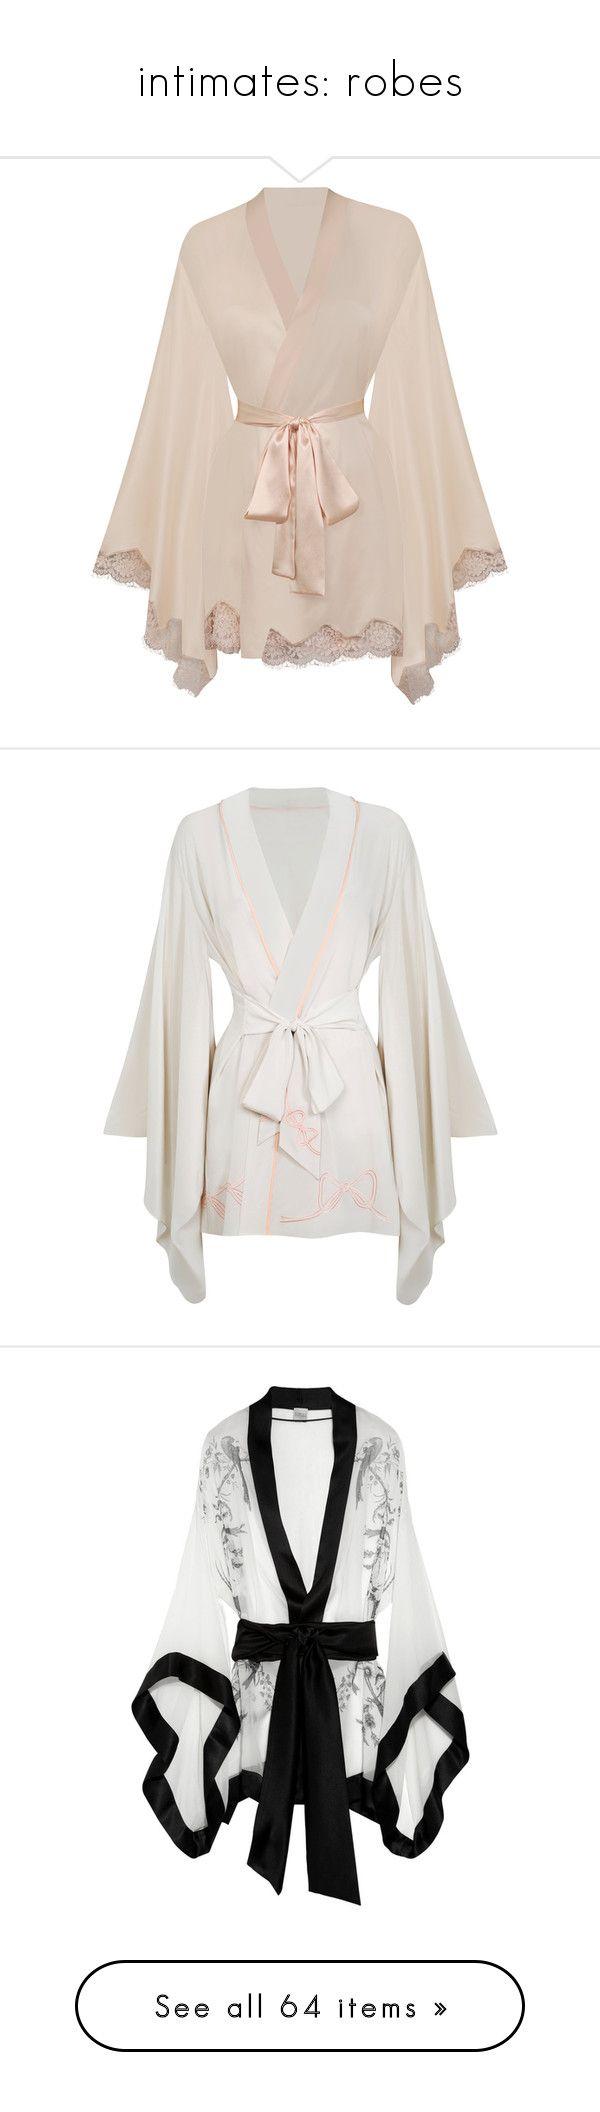 """intimates: robes"" by fallen-midnight ❤ liked on Polyvore featuring intimates, robes, lingerie, pajamas, sleepwear, kimono, nightwear, cream, gowns & kimonos and kimono robe"